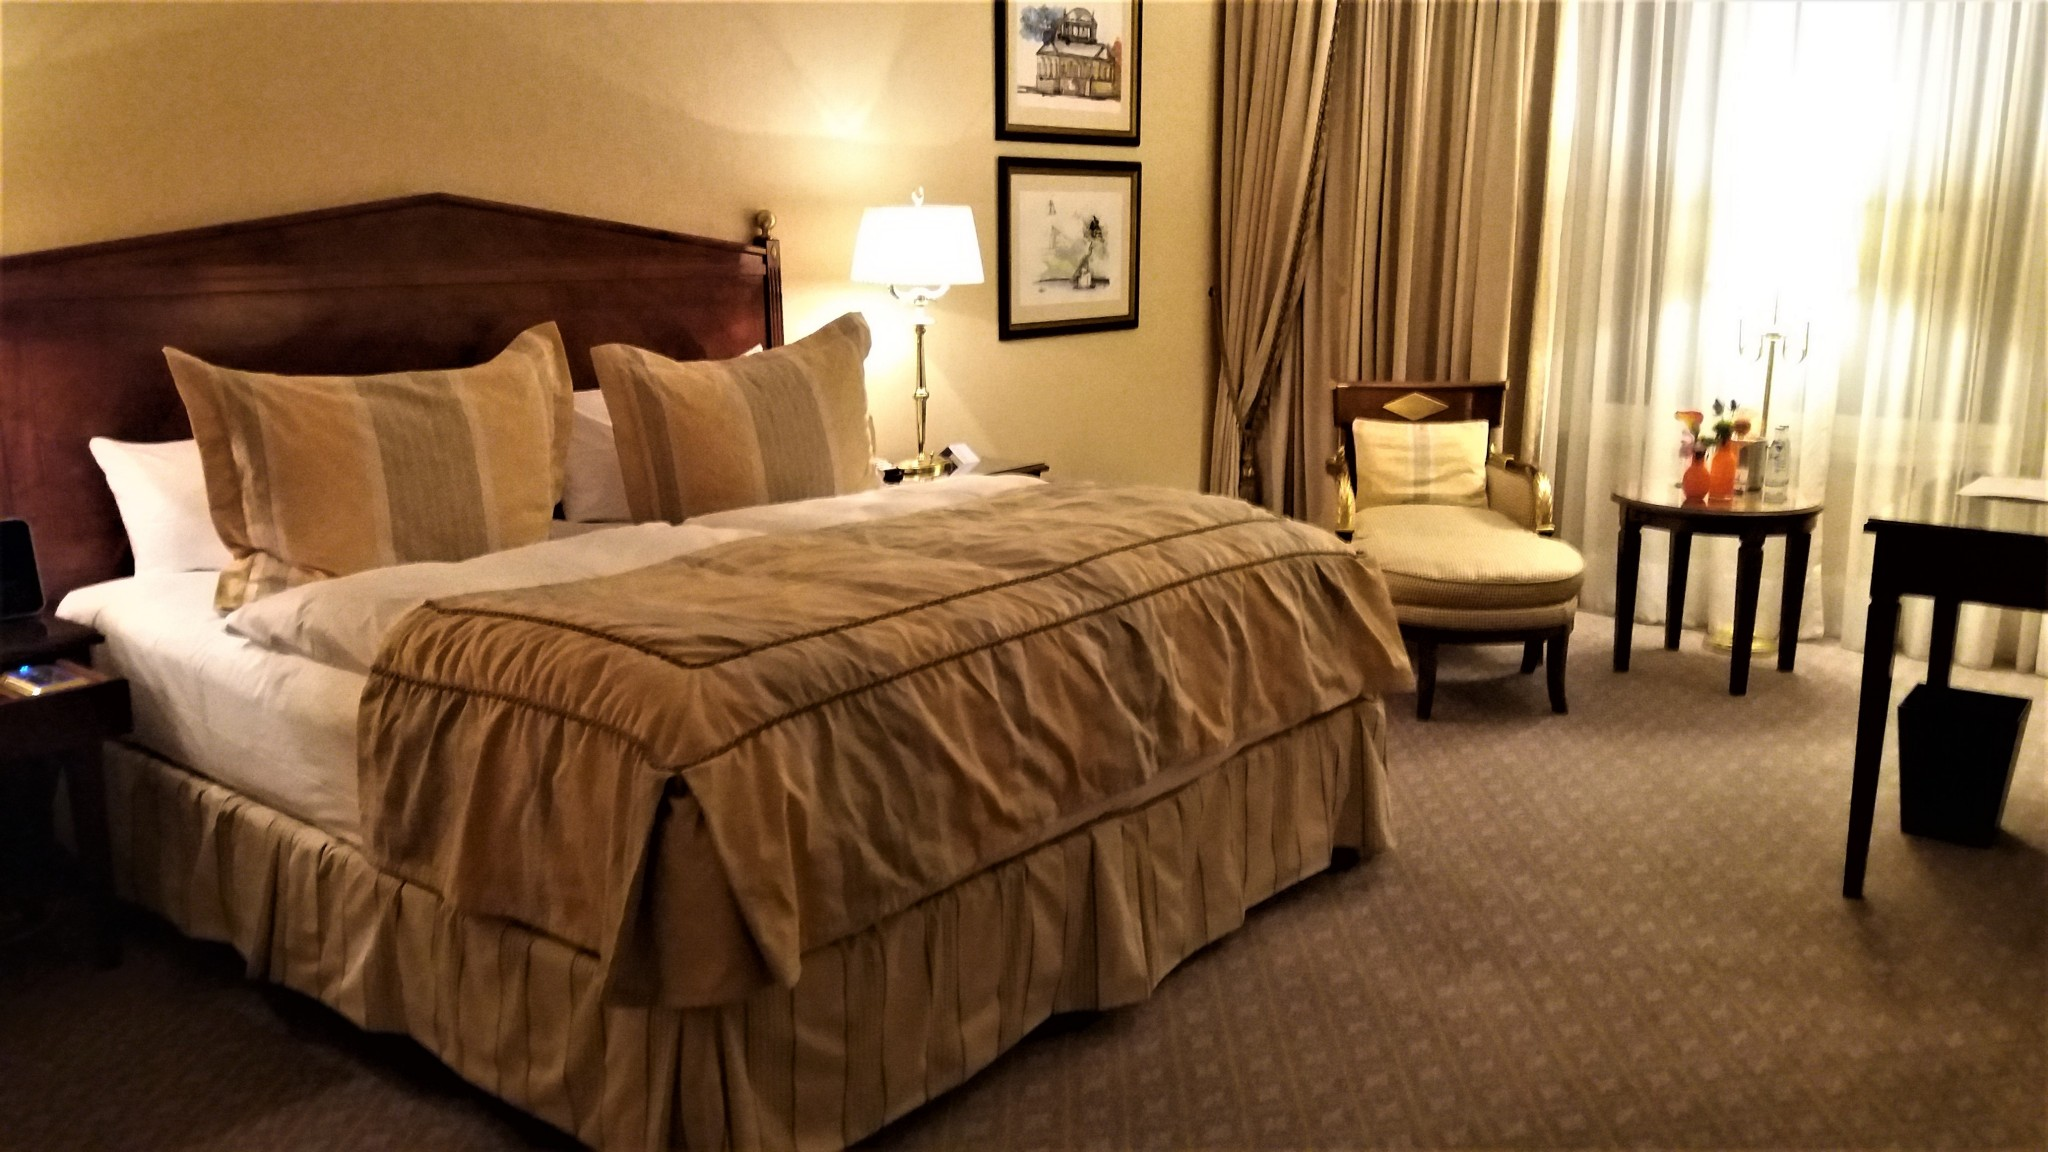 The Ritz-Carlton Berlin Room 2